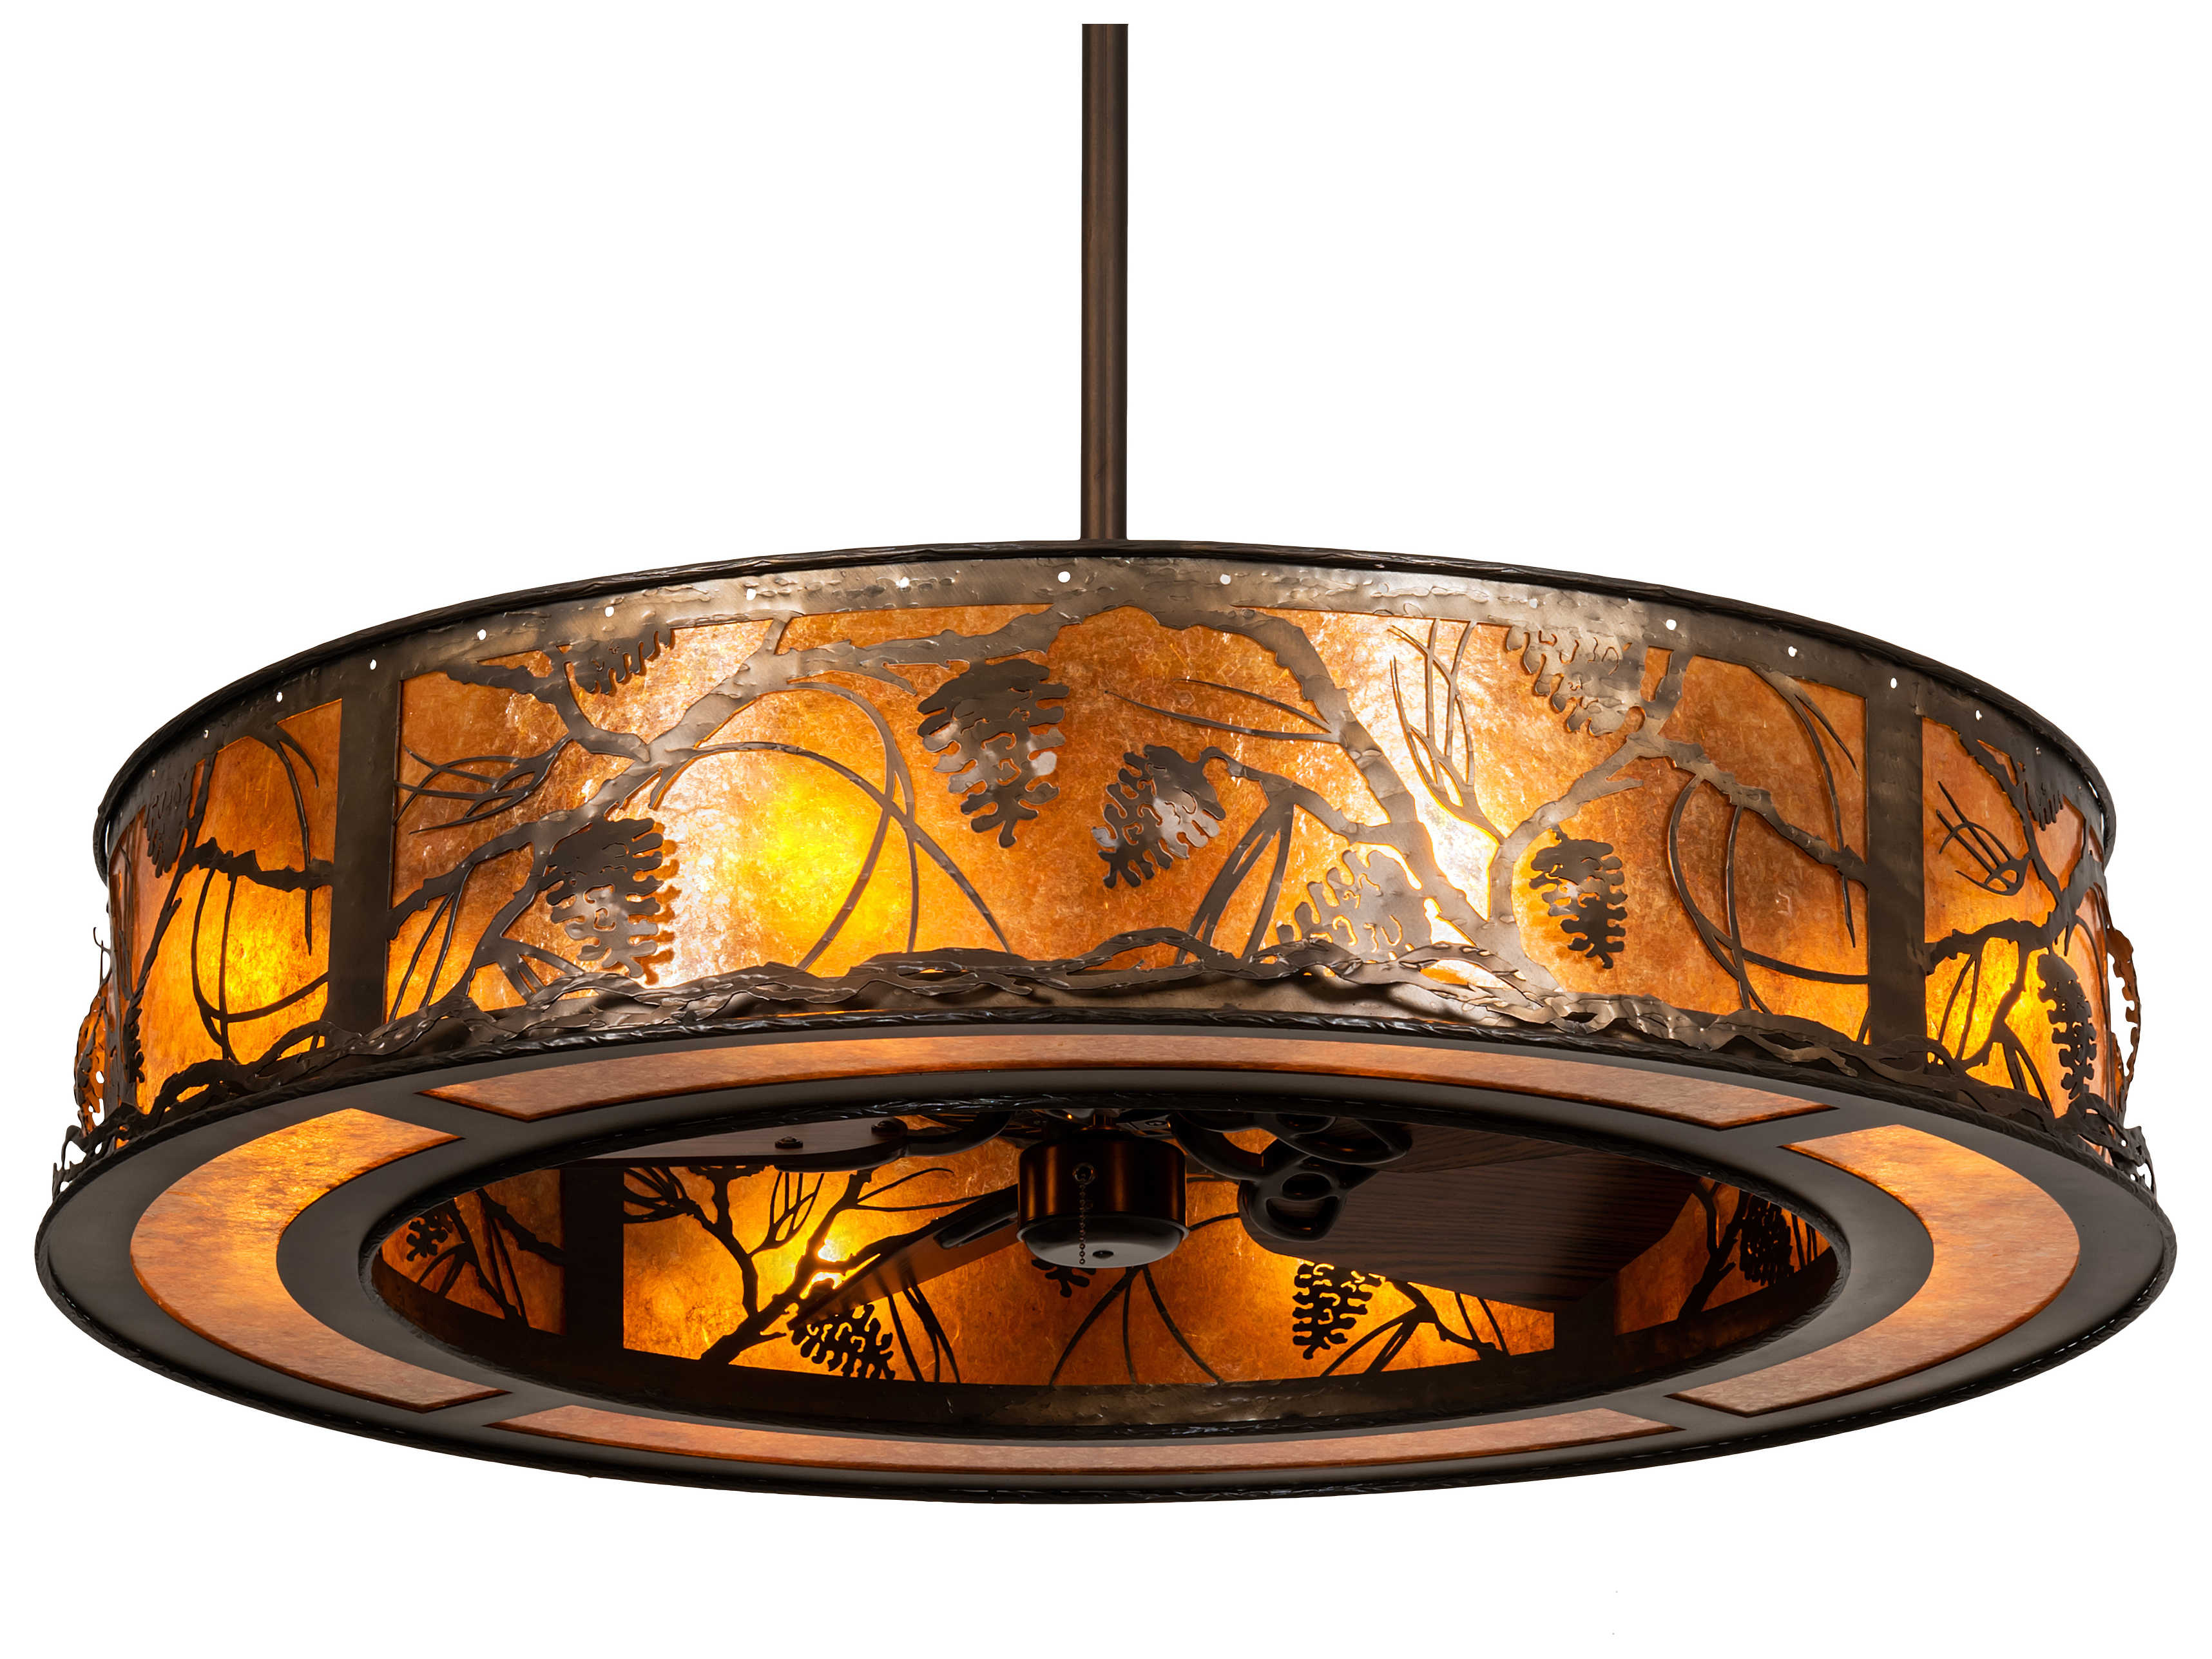 Meyda Whispering Pines Antique Copper 8 Light 45 Wide Indoor Outdoor Ceiling Fan My228668